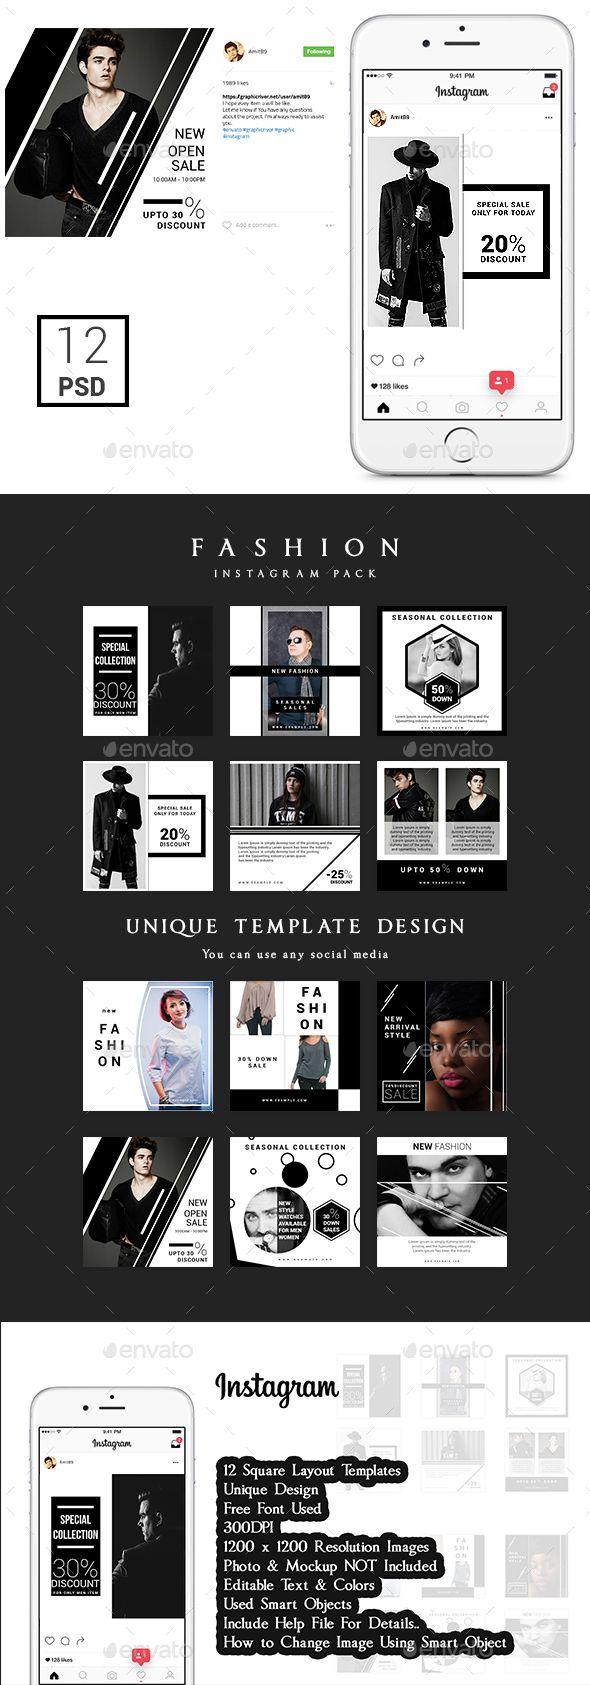 Promotional Instagram Fashion Pack - Web Elements